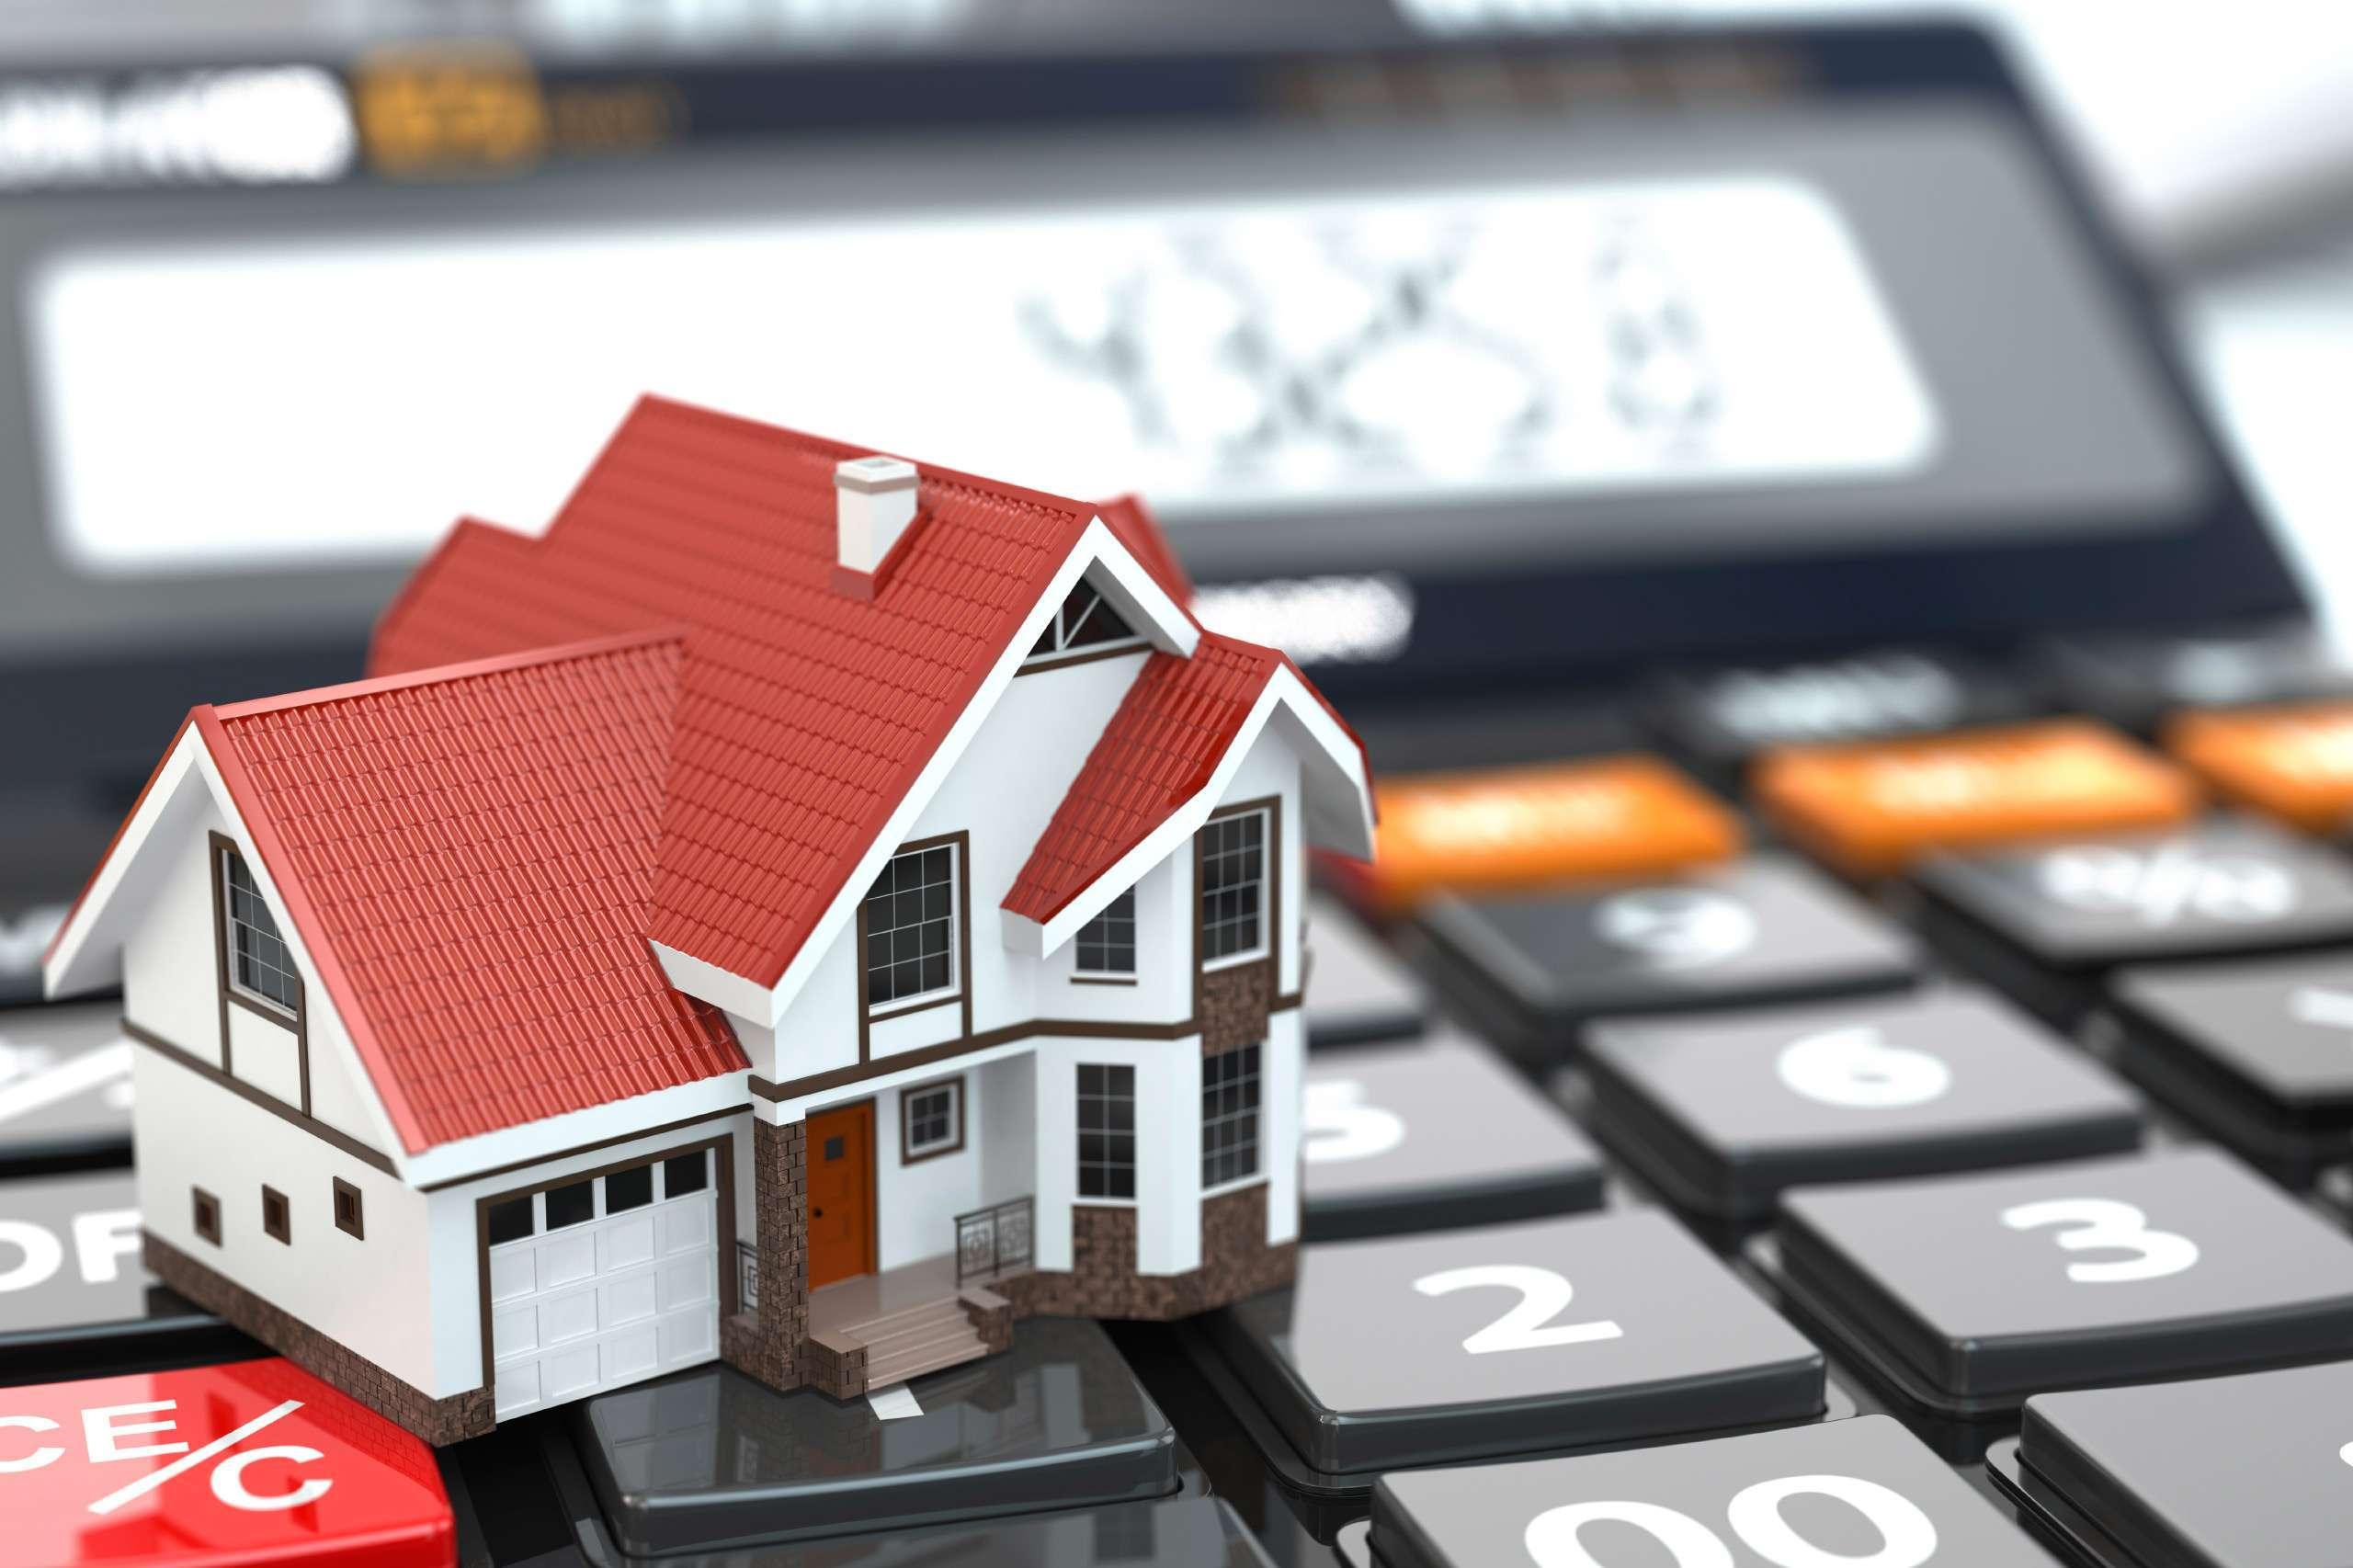 уплата налога на арендованное имущество шапочка жаккардовым узором